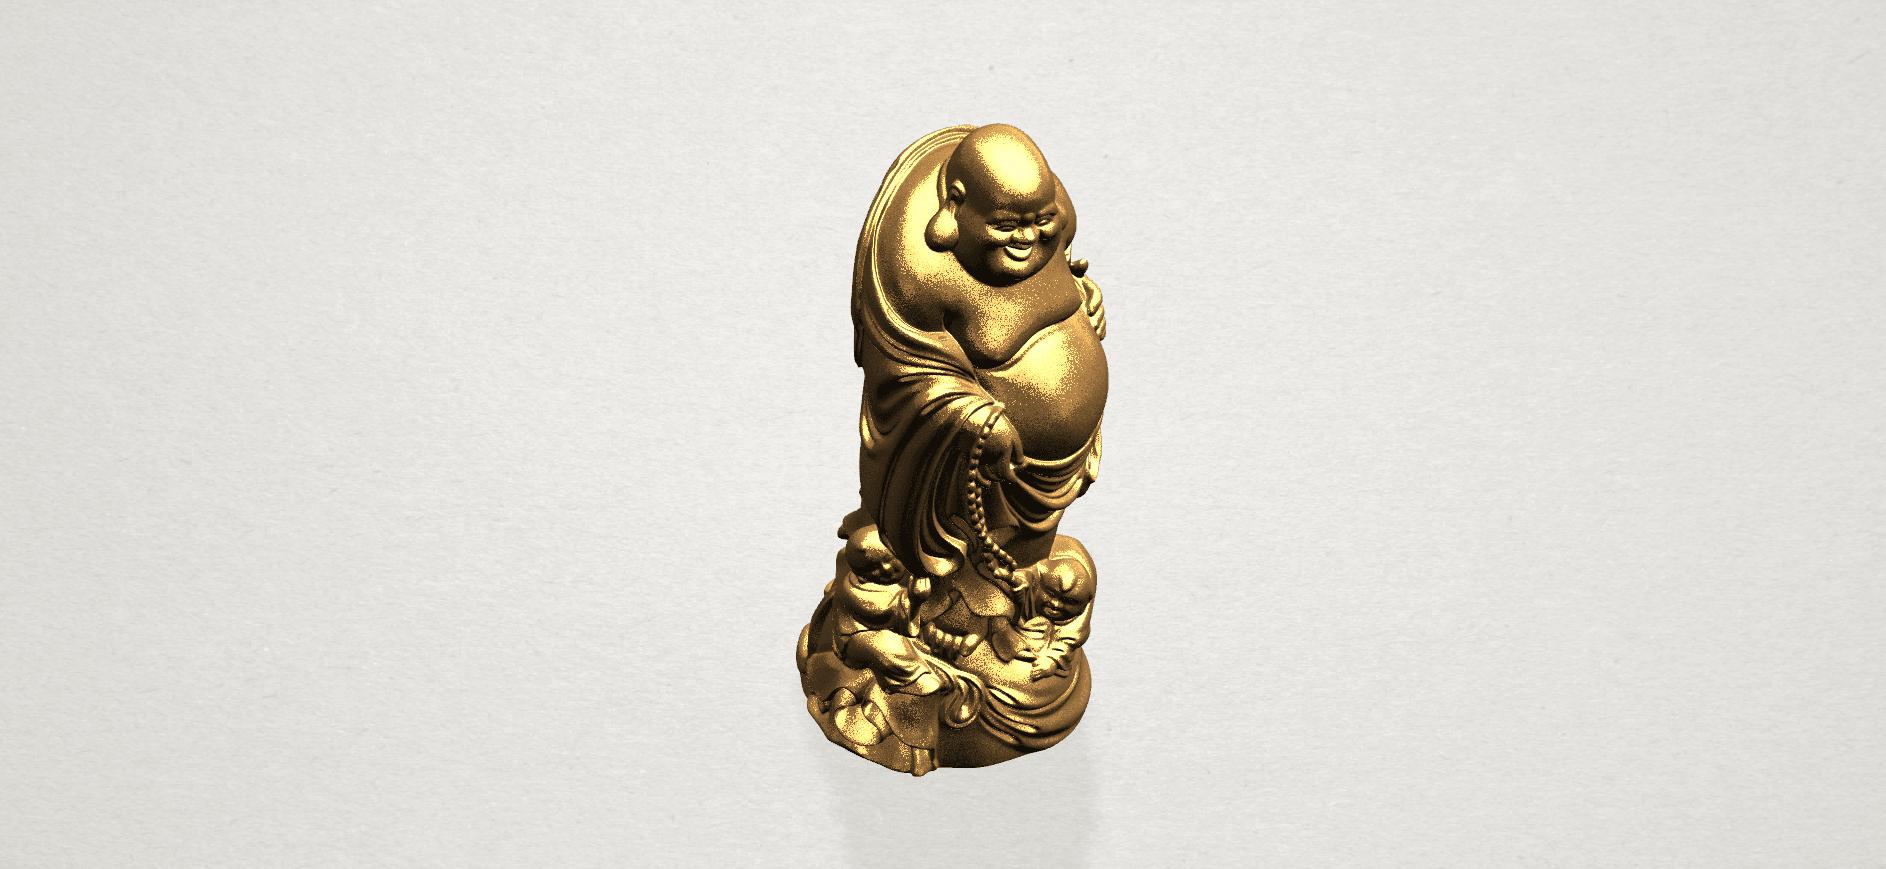 TDA0070 Metteyya Buddha 03 - 88mm - A10.png Download free STL file Metteyya Buddha 03 • 3D printing object, GeorgesNikkei